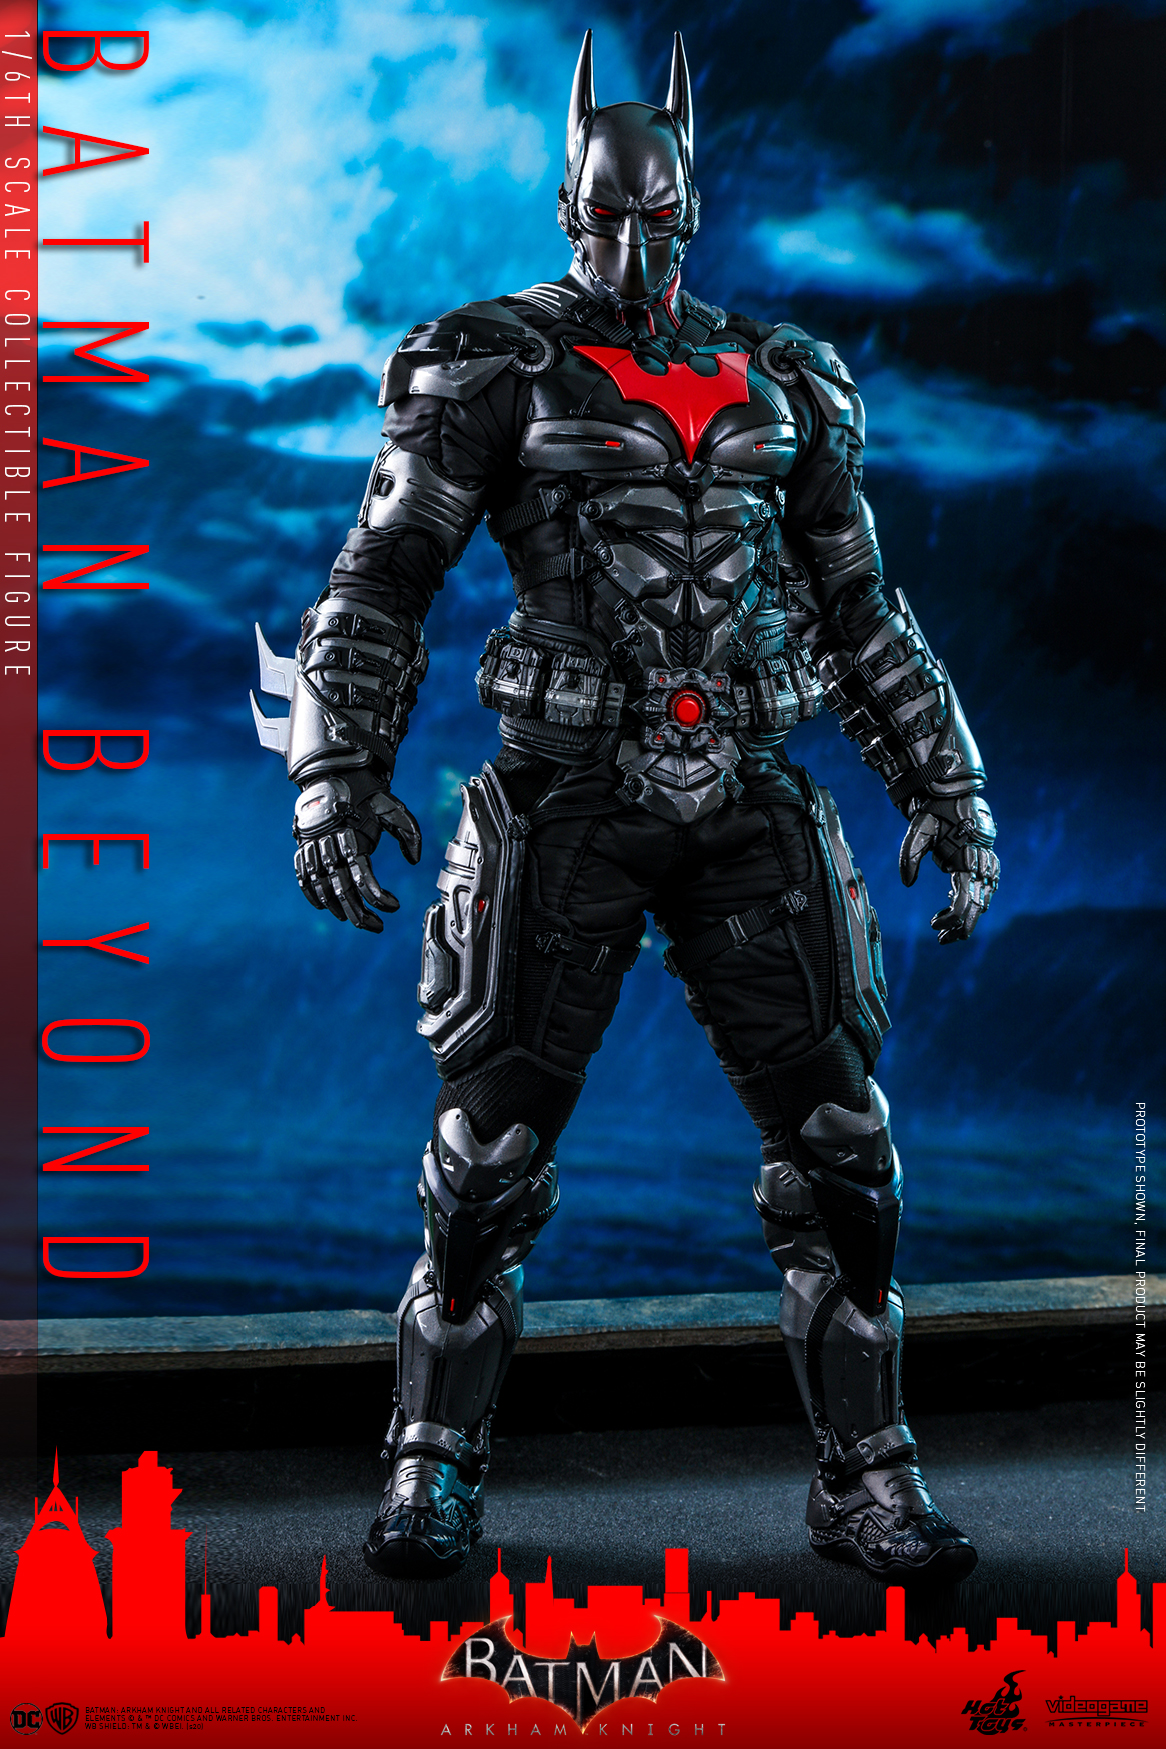 1/6 Male Soldier Action Figure Durable Flexible Body Model